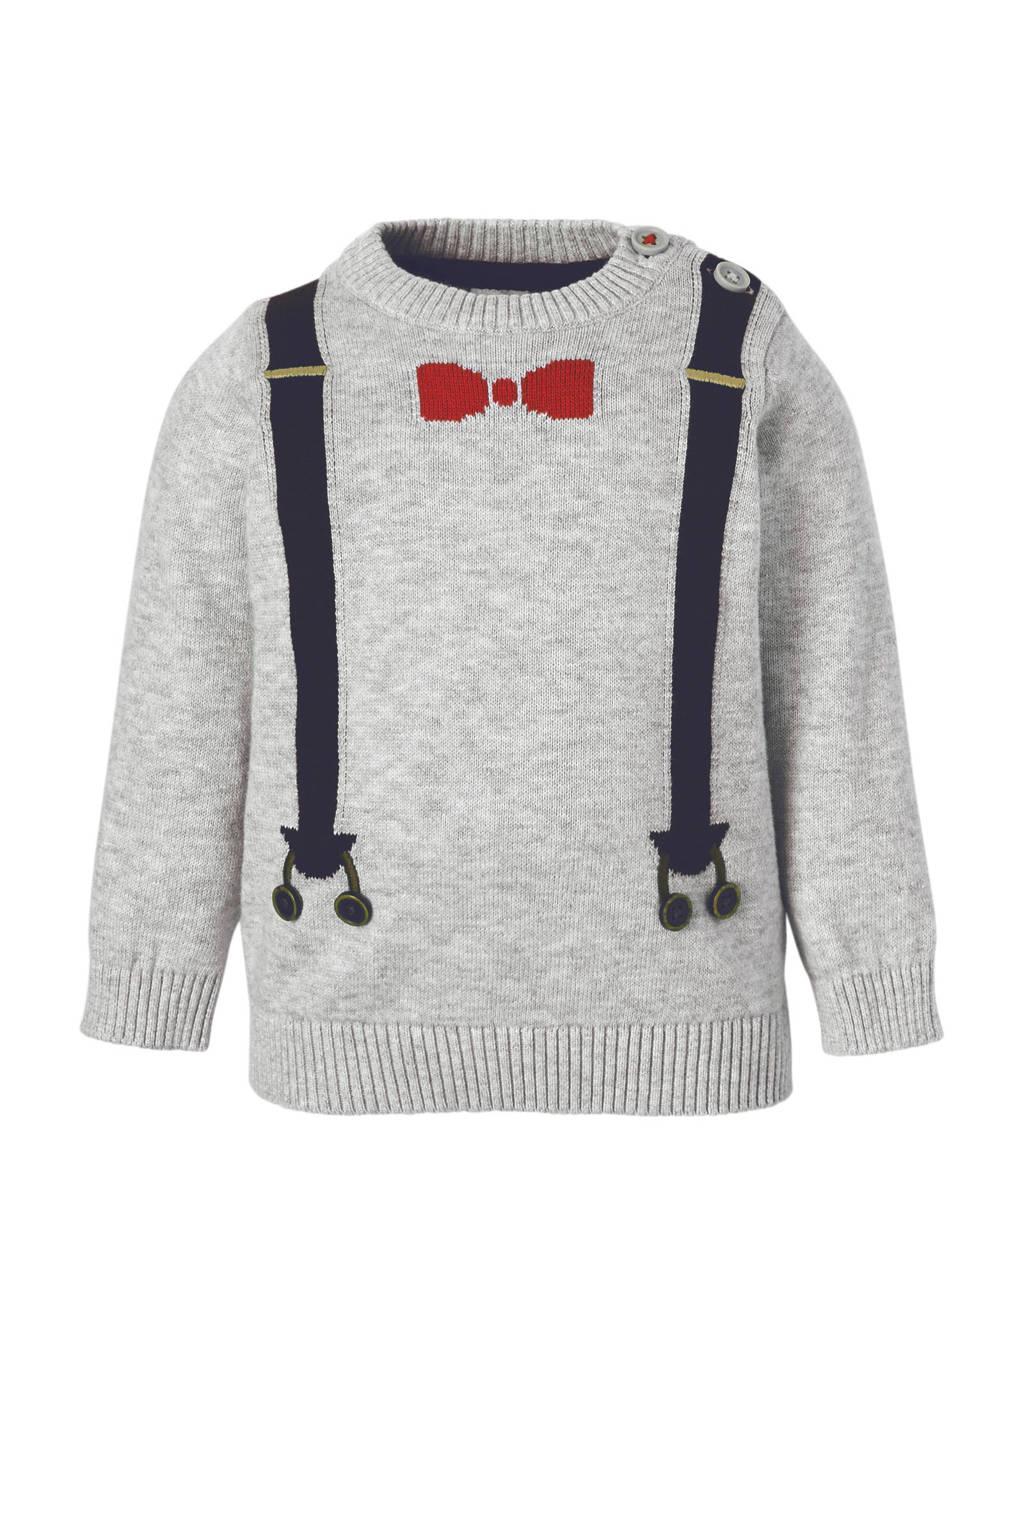 C&A Baby Club trui met bretels en strik grijs, Grijs